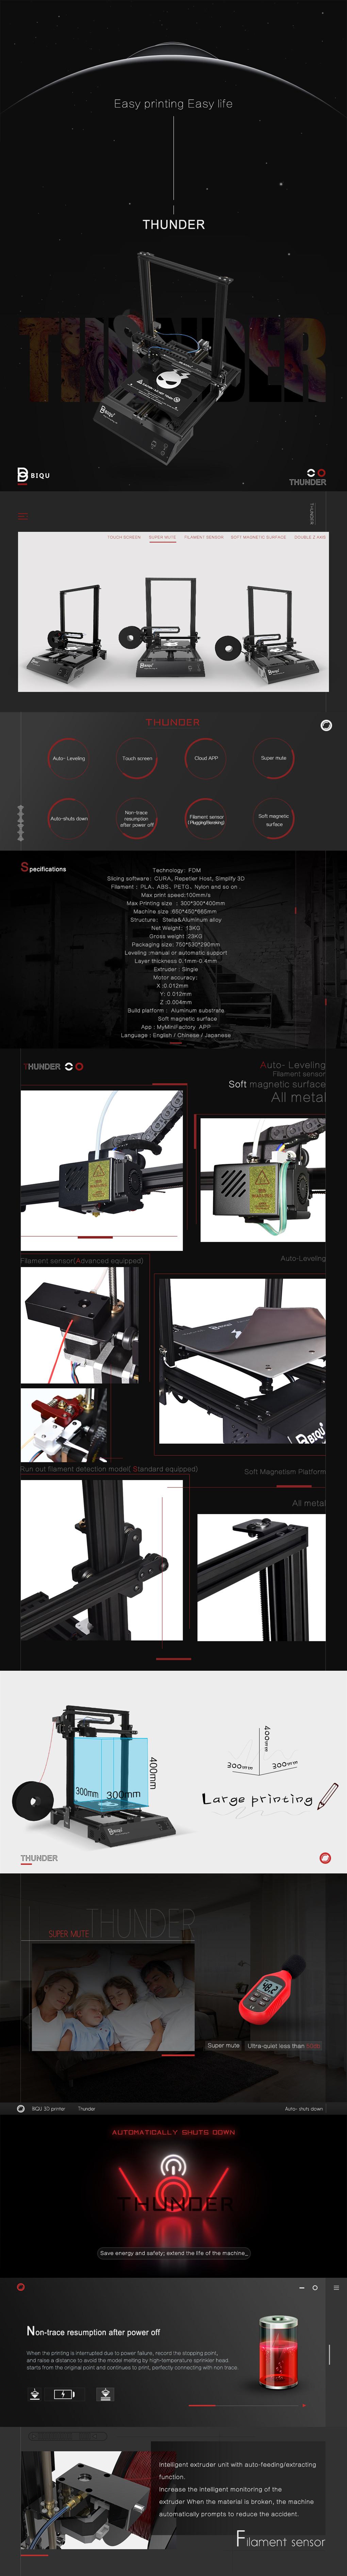 BIQU® Thunder Desktop Dual Z-axis 3D Printer Support Auto-leveling